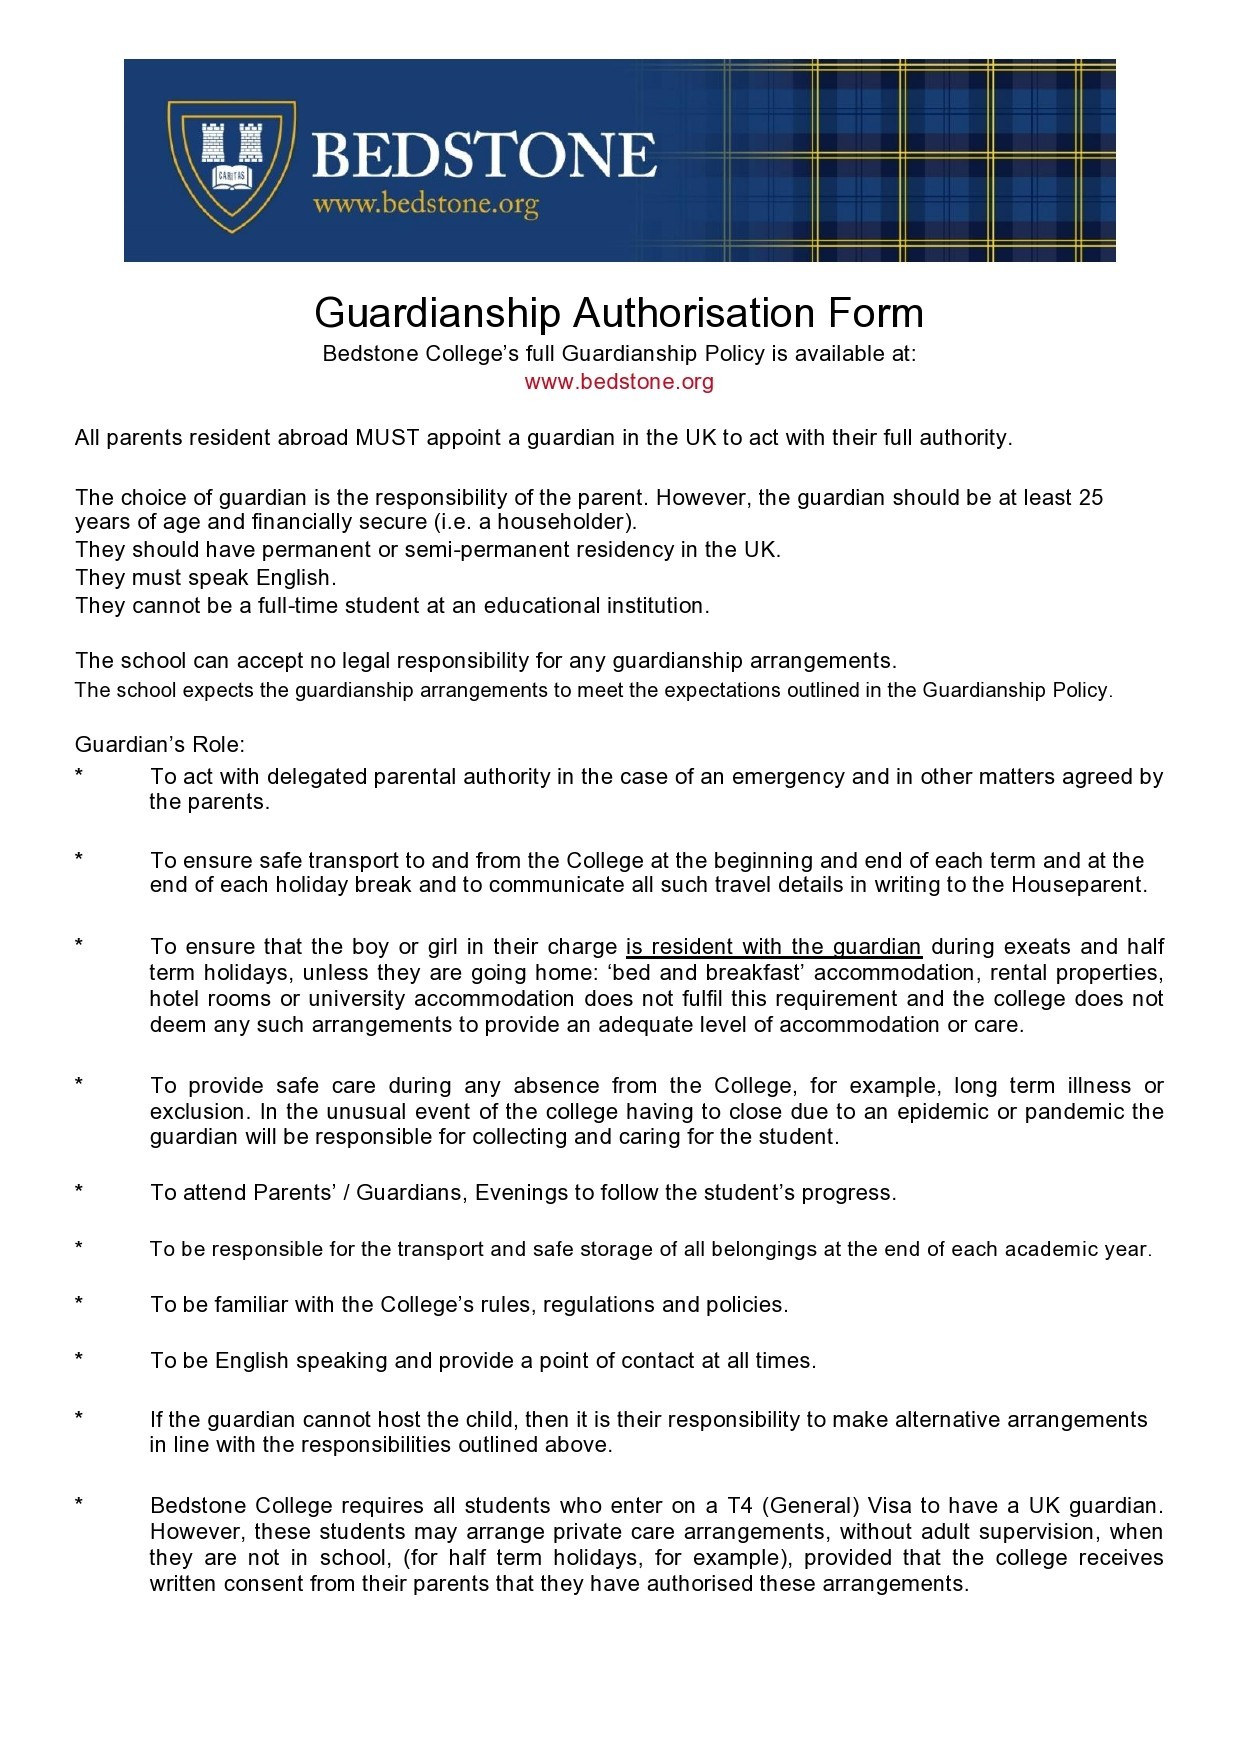 Free guardianship form 48